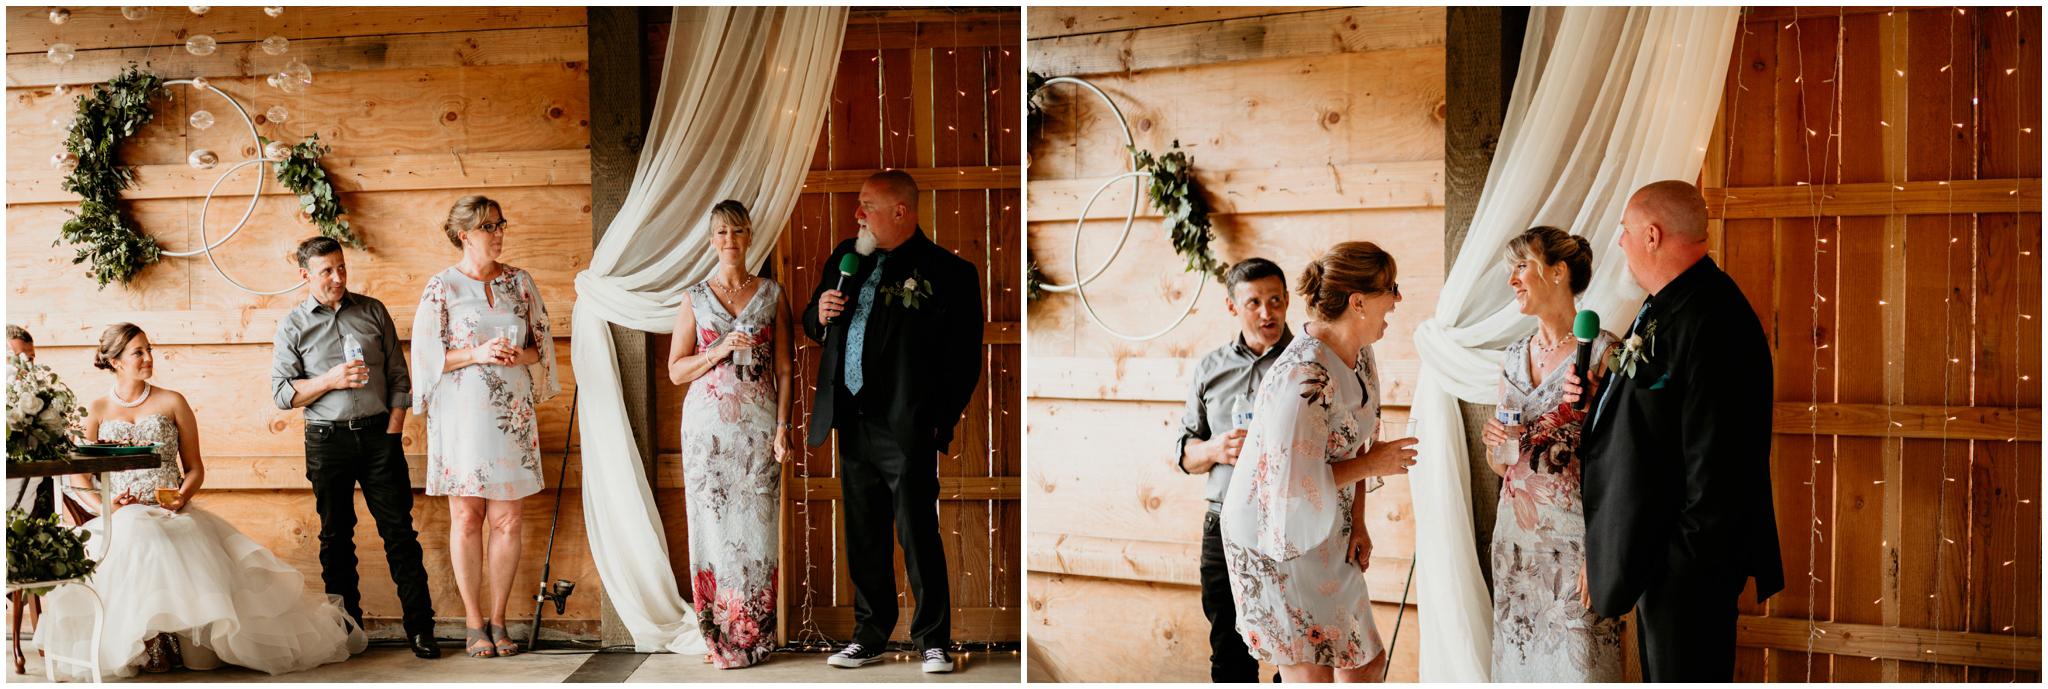 alex-and-matthew-three-cs-farm-venue-seattle-wedding-photographer-124.jpg